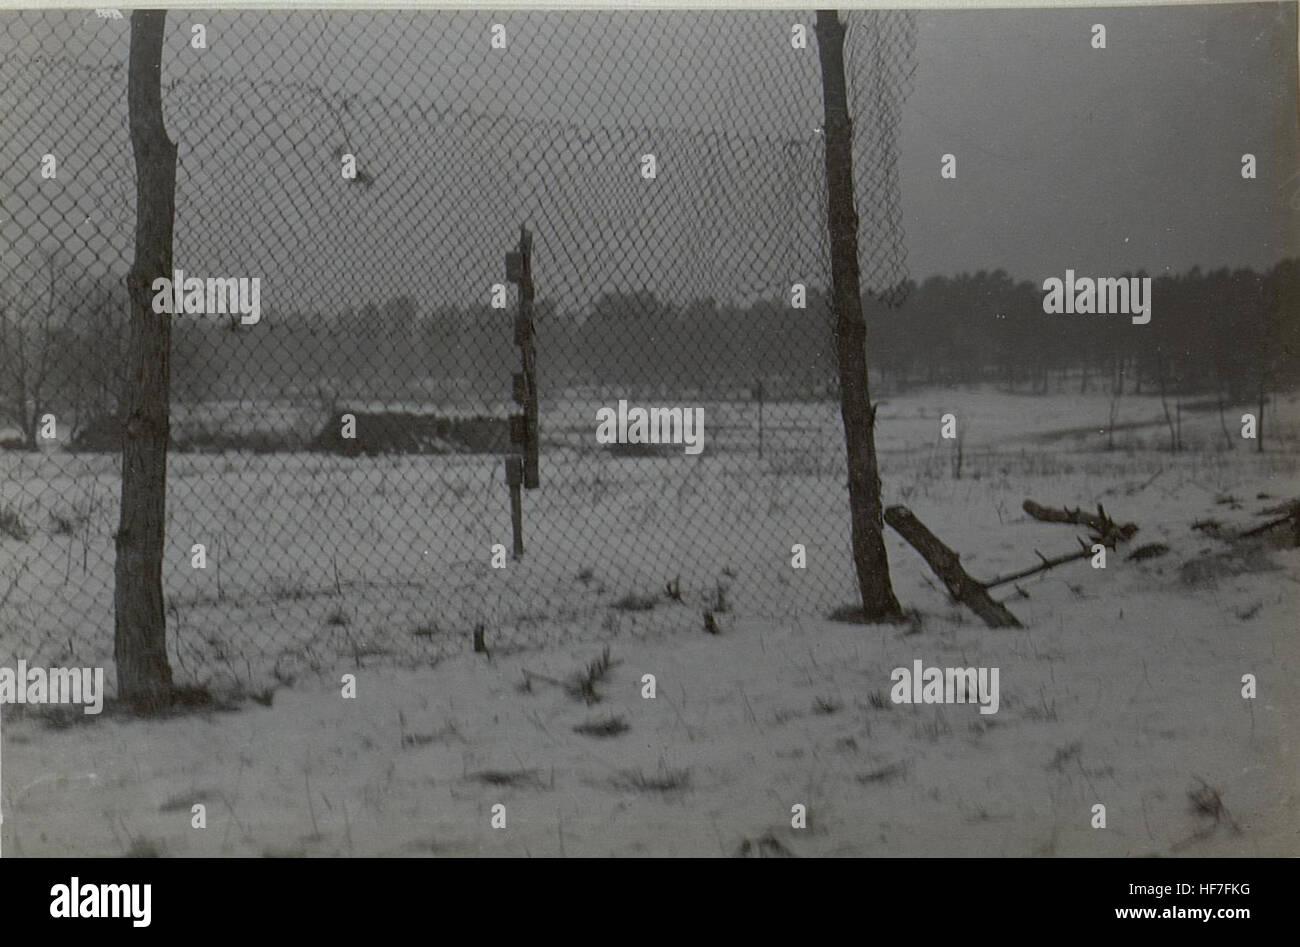 Maschendraht Stock Photos & Maschendraht Stock Images - Alamy